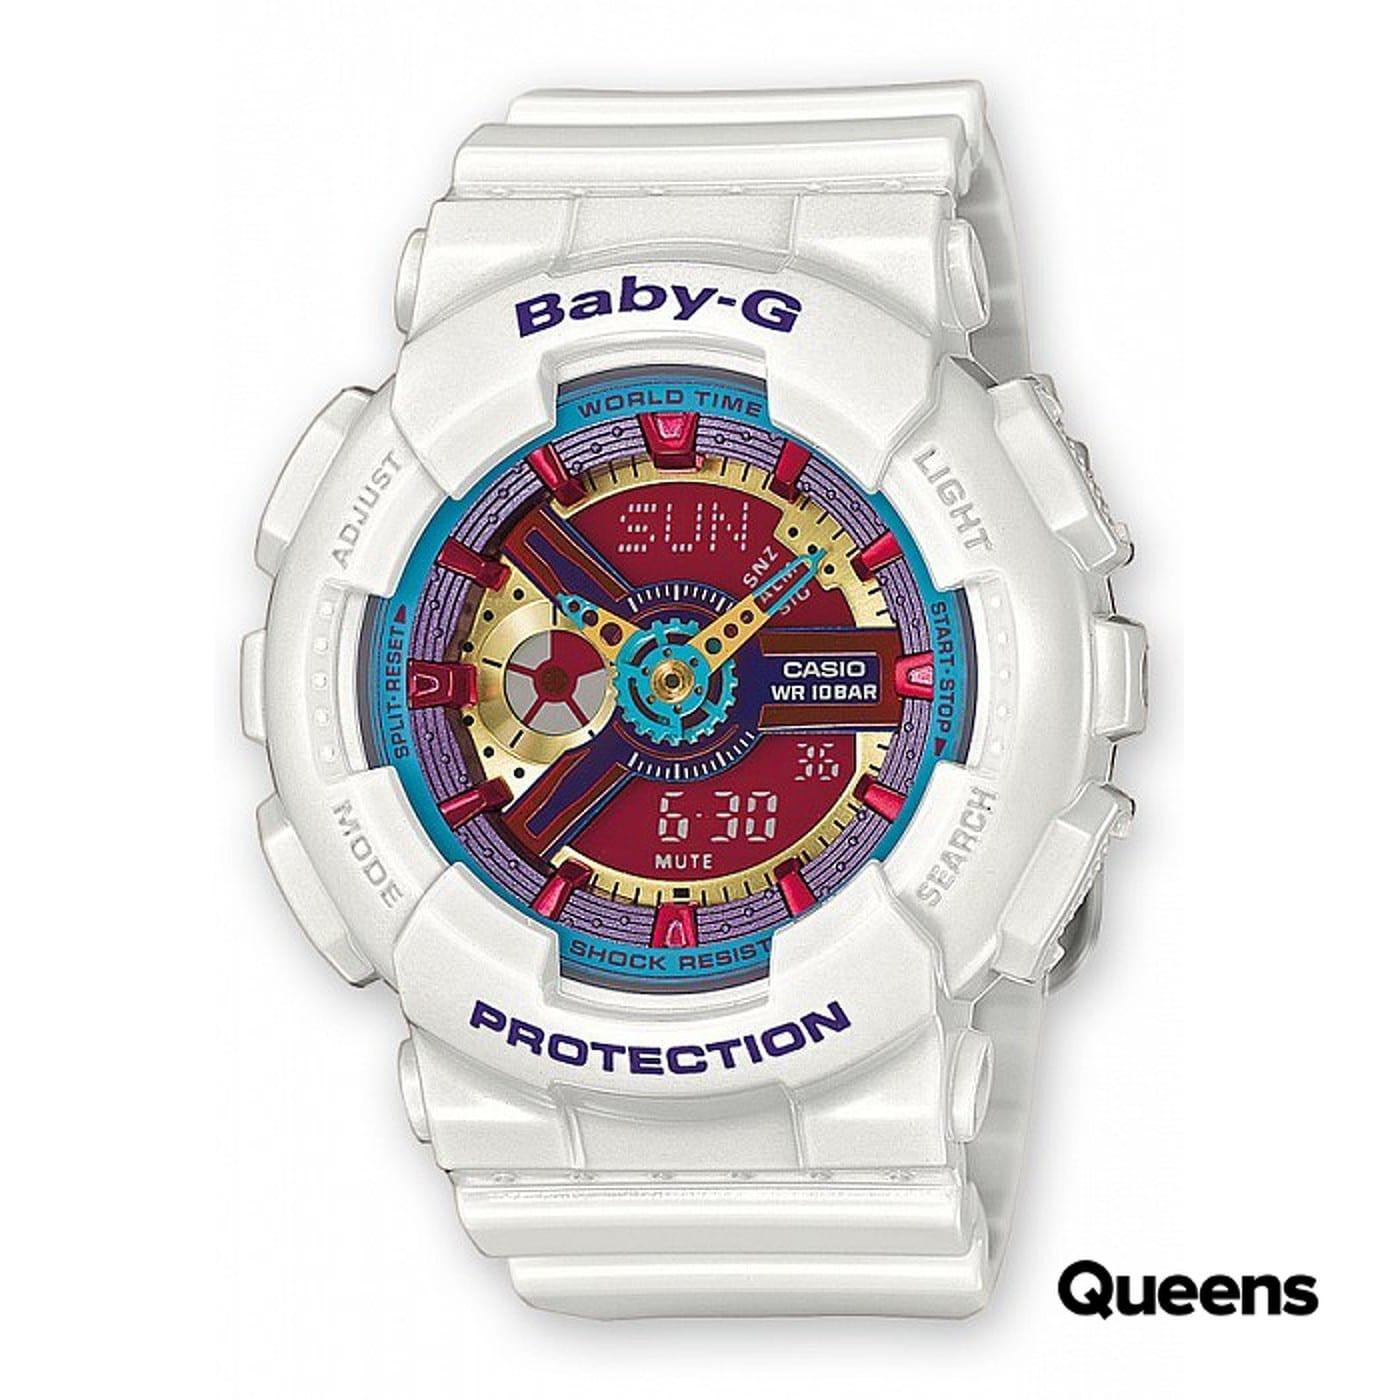 533b0a7bd32 Hodinky Casio Baby-G BA 112-7AER – Queens 💚